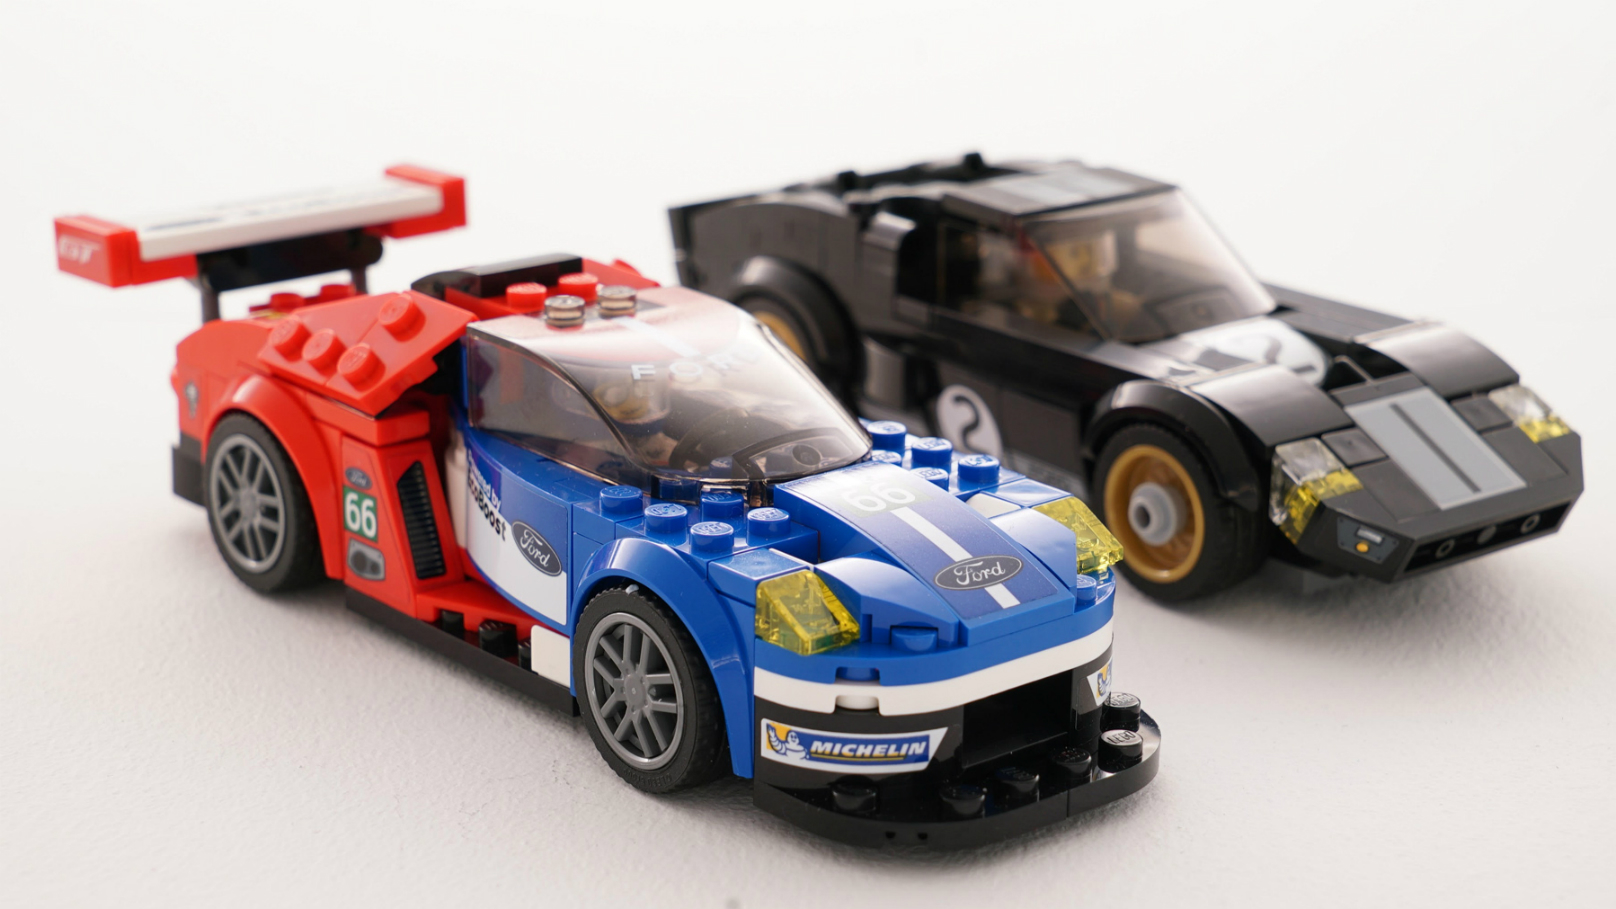 ford-lego-racecars